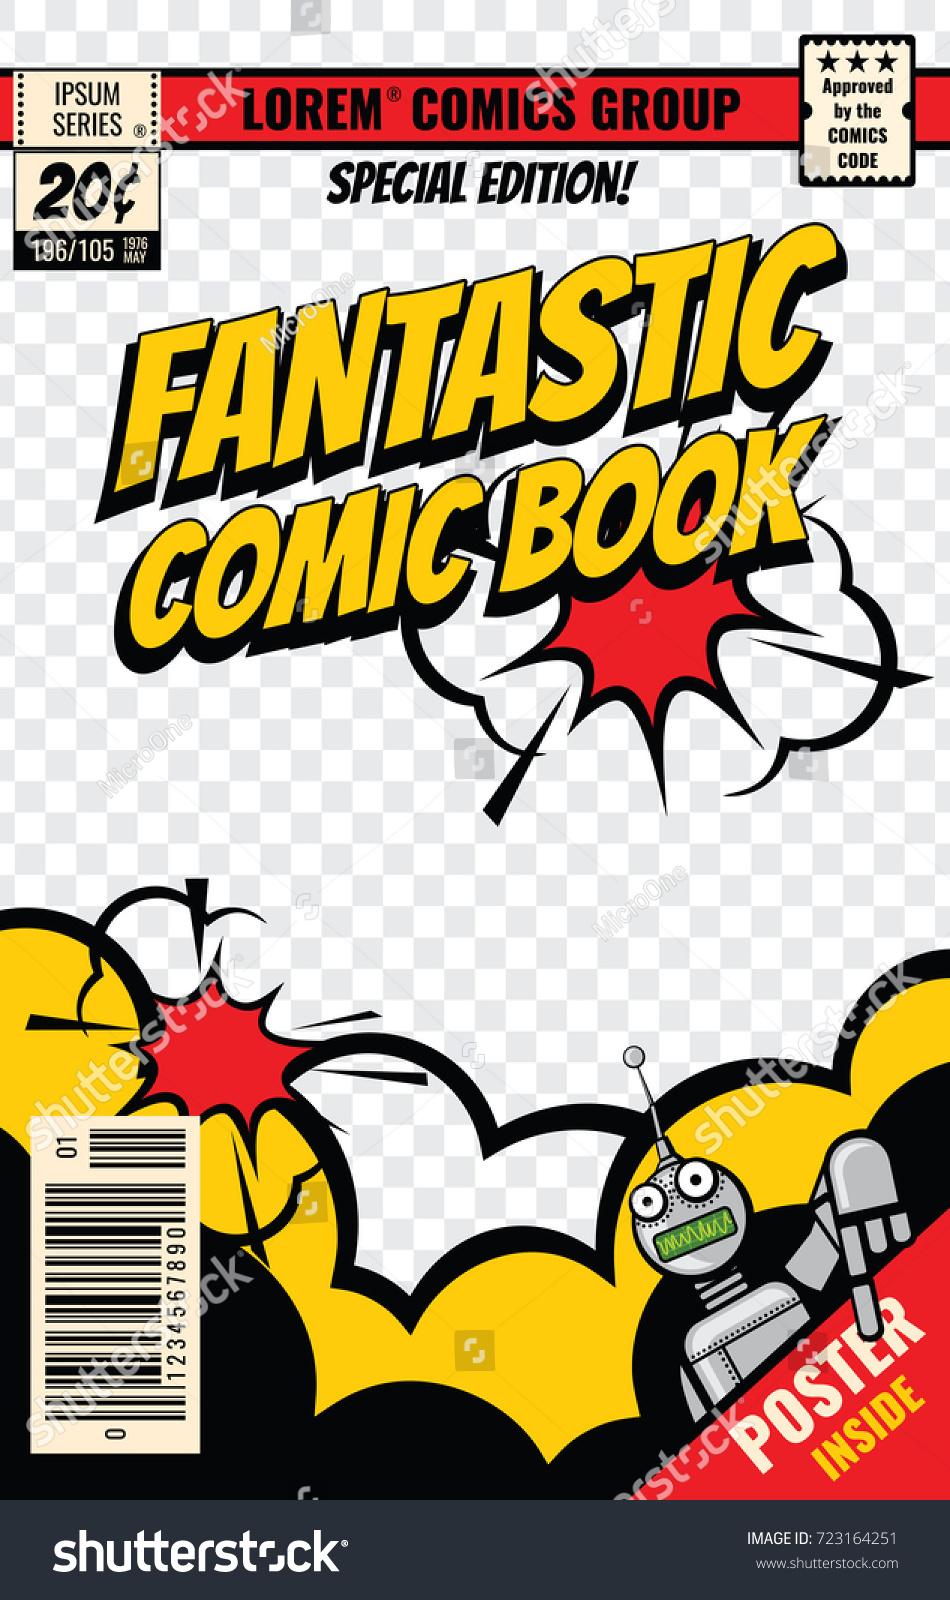 comic book cover vector template comic stock vector 723164251 shutterstock. Black Bedroom Furniture Sets. Home Design Ideas